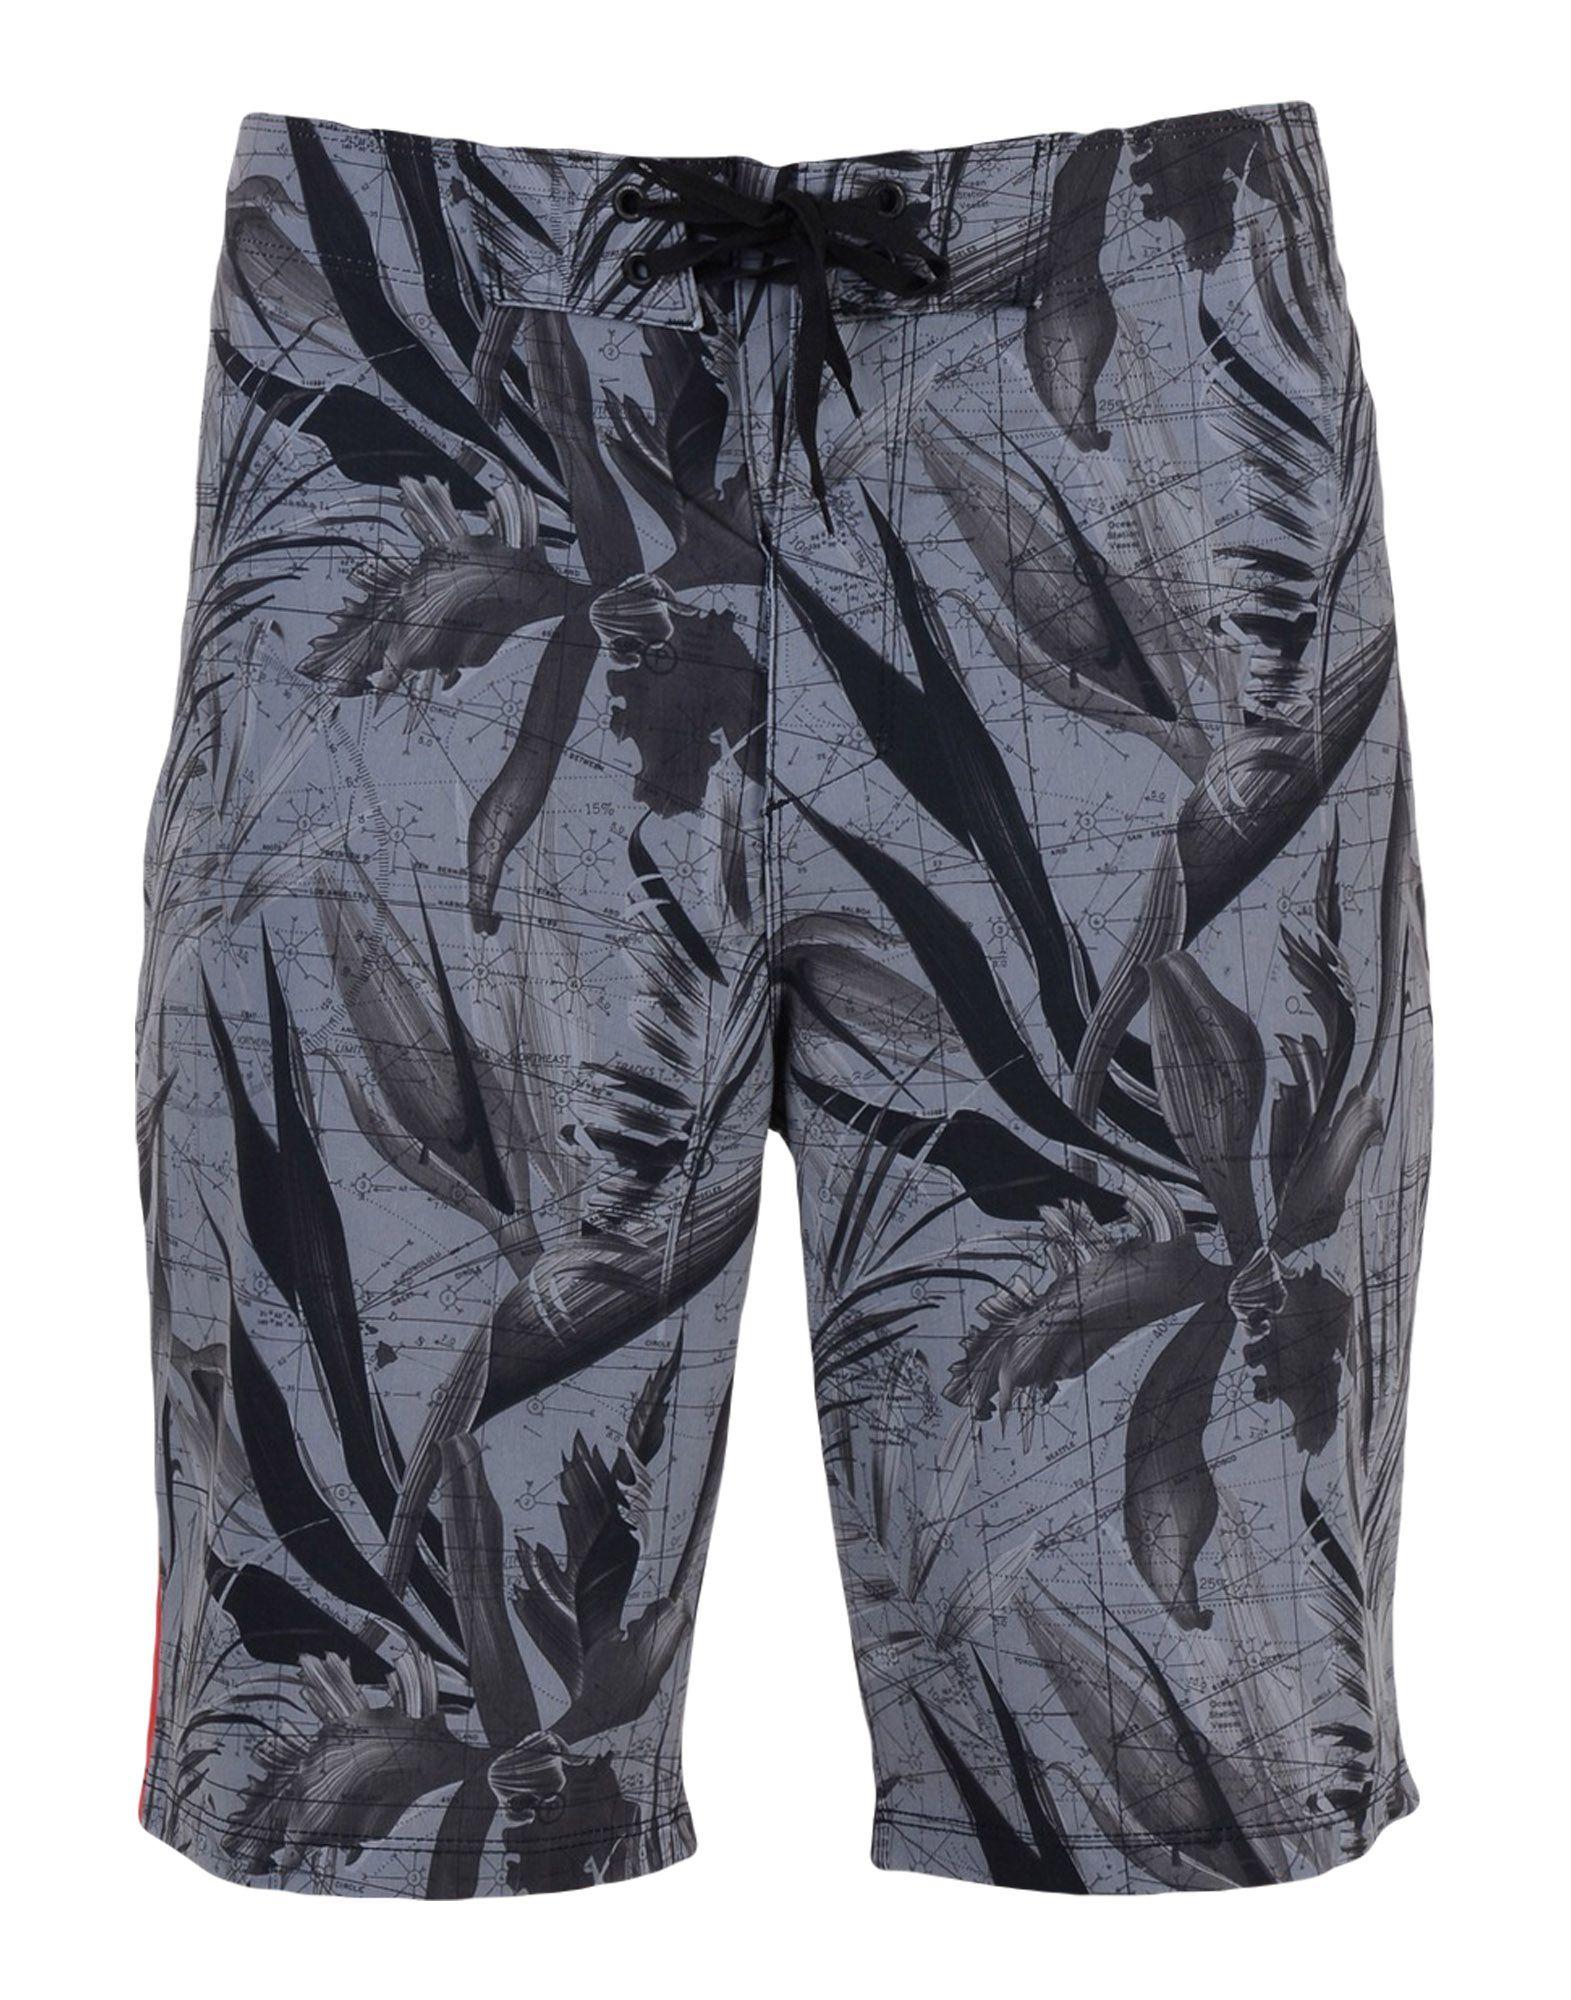 HURLEY Пляжные брюки и шорты chris hurley wardriving drive detect defend